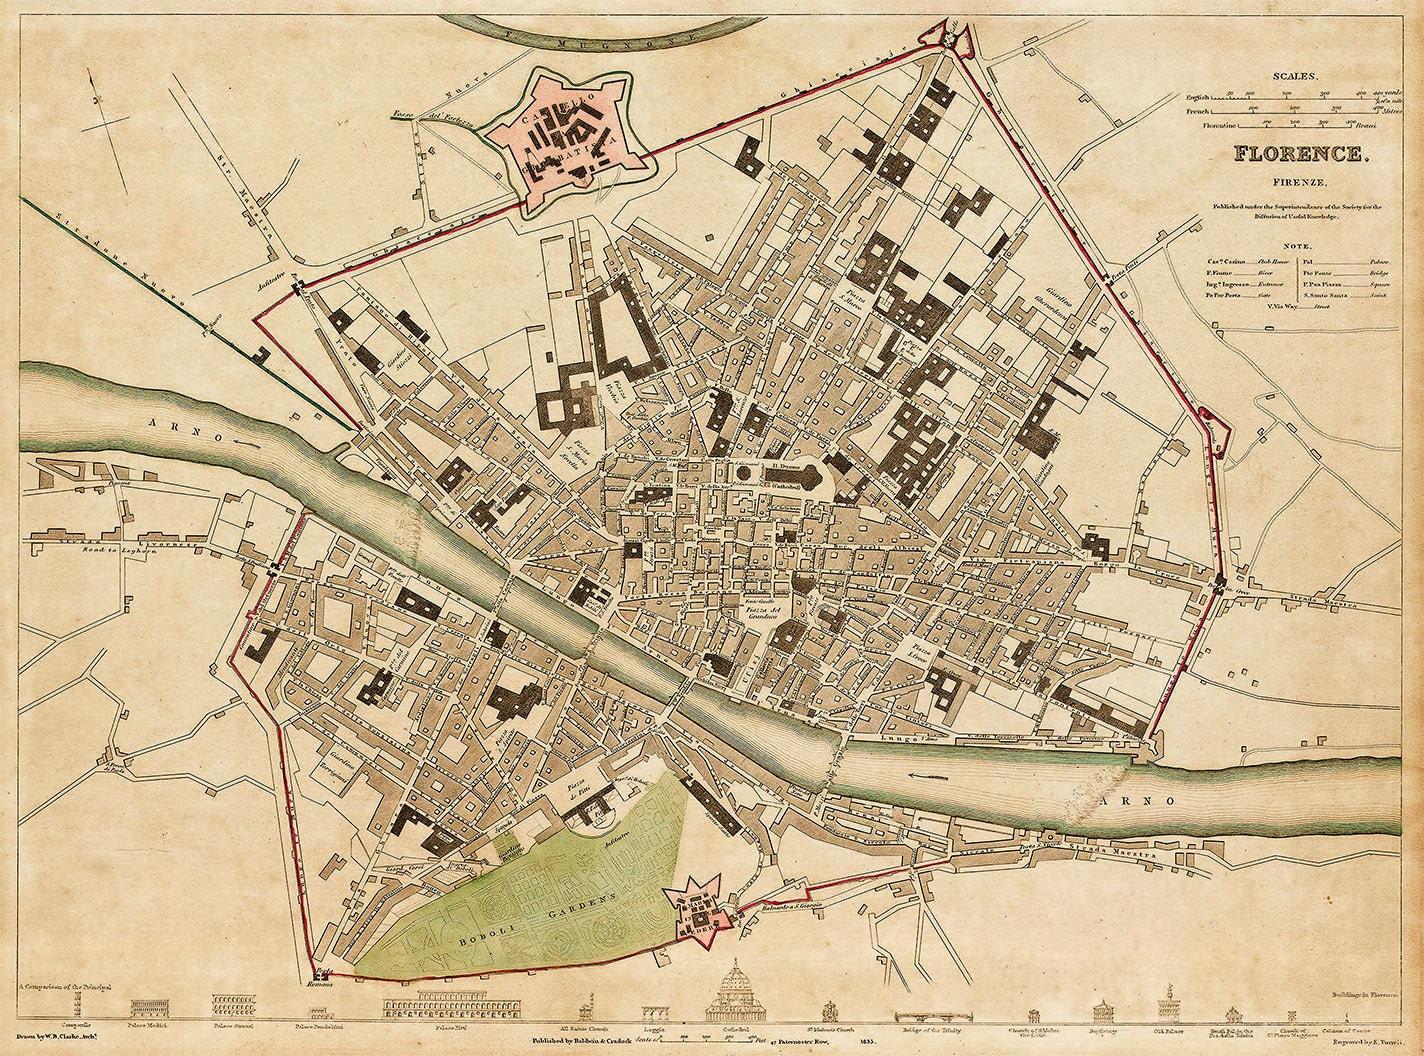 historical maps of florence alabama mall - photo#8